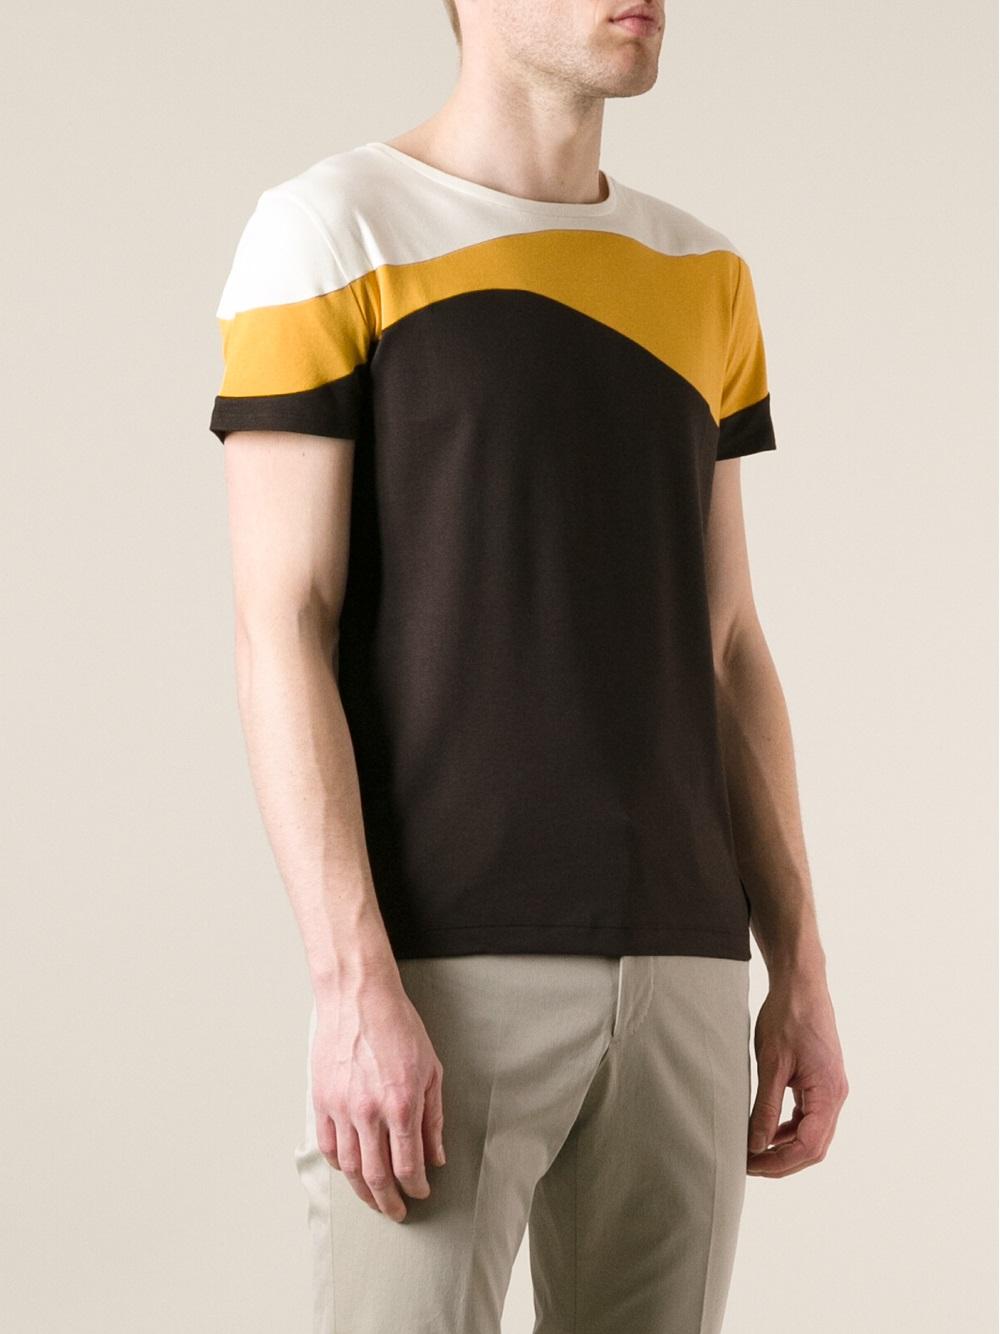 Fendi Colour Block Tshirt In Brown Yellow For Men Lyst